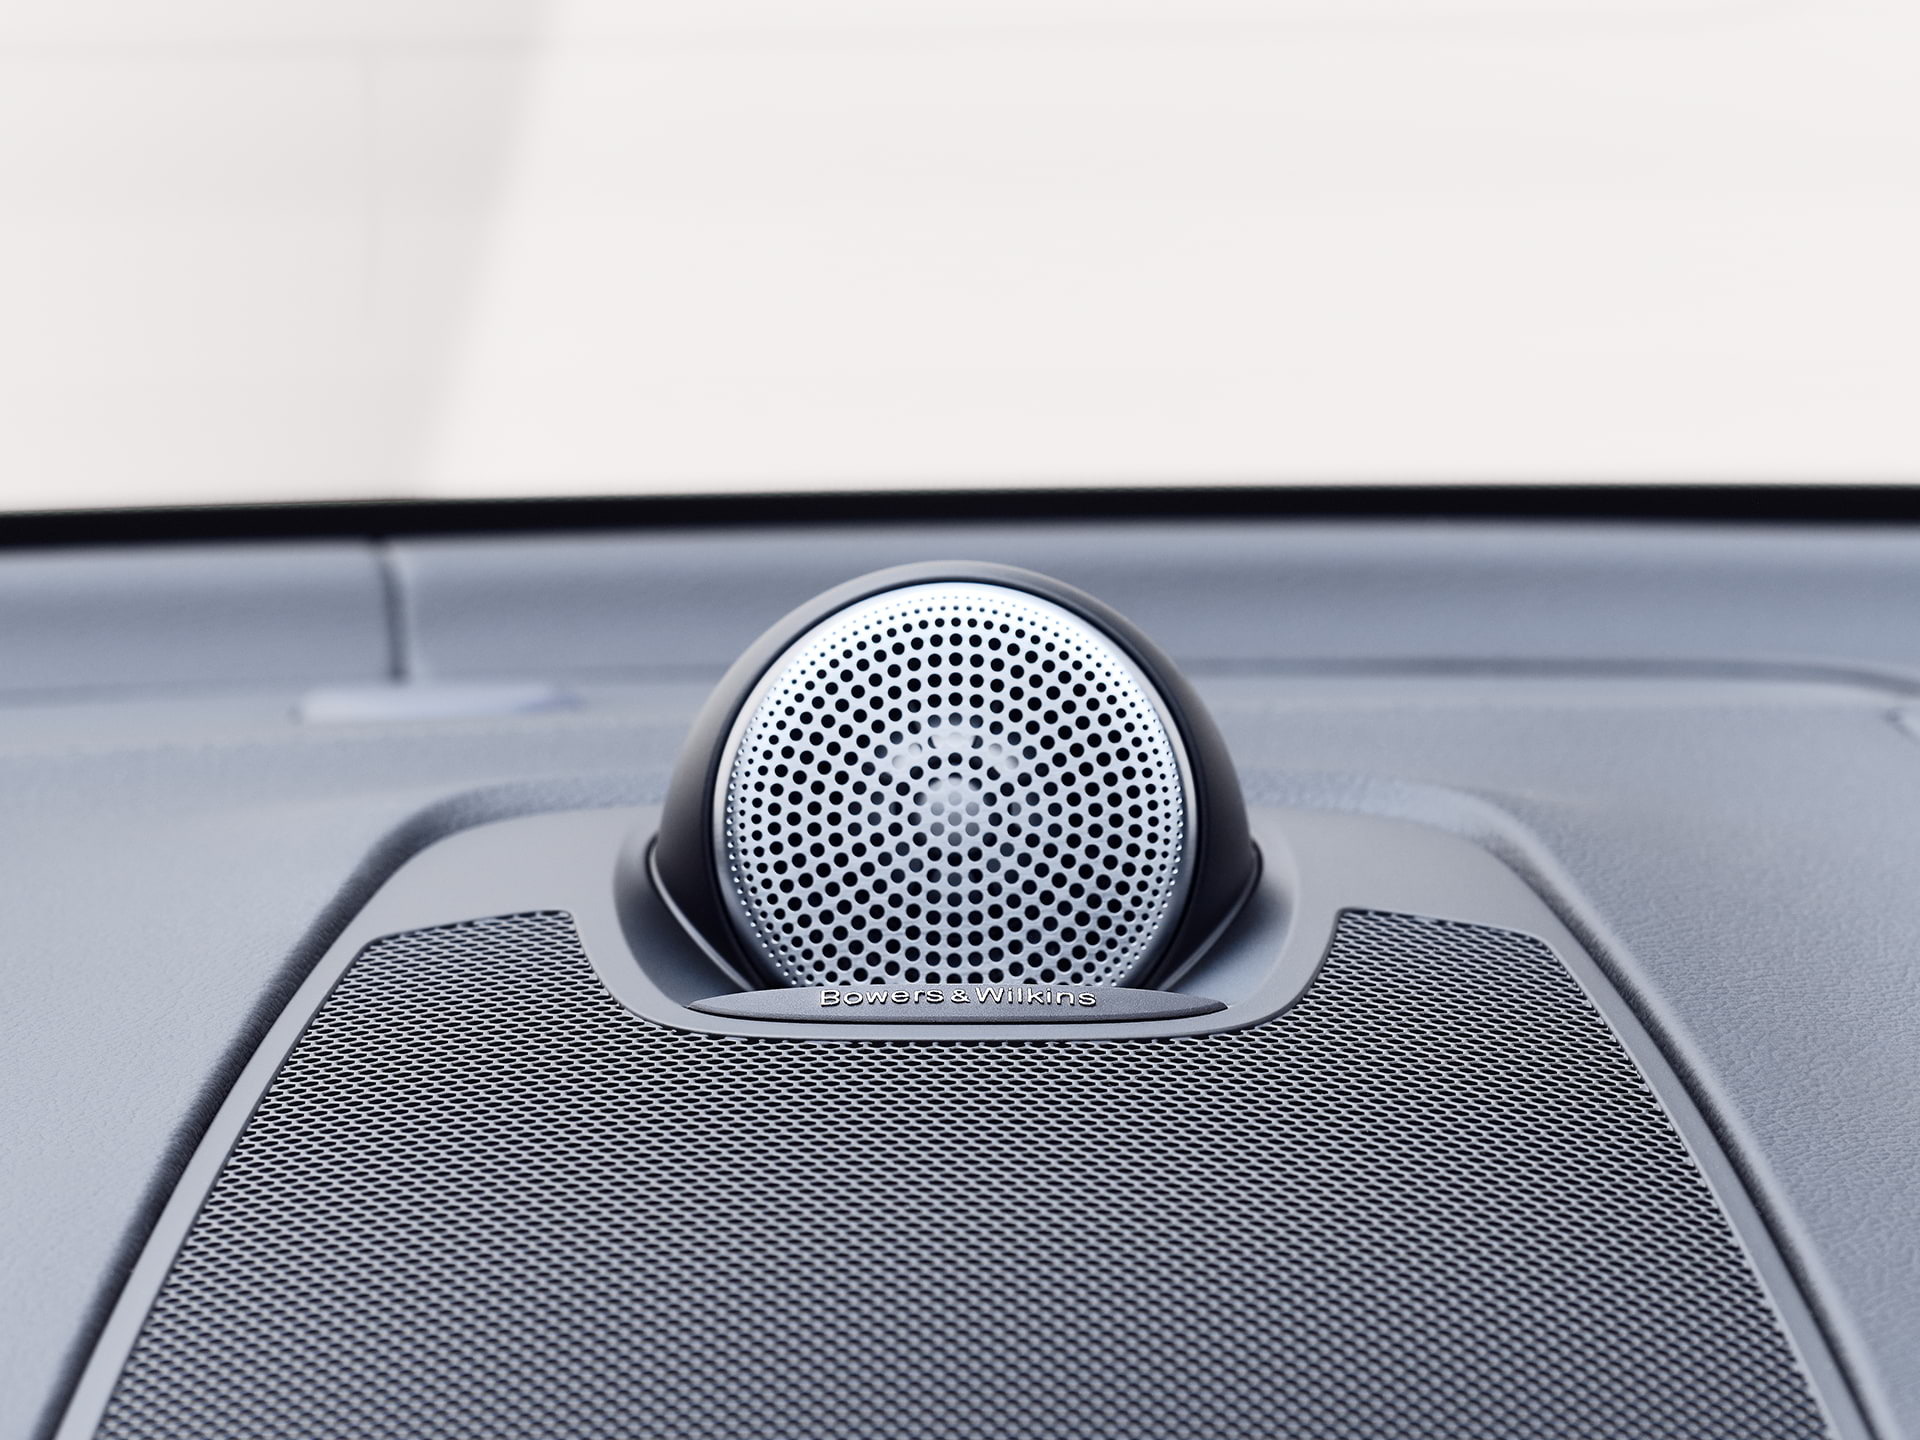 Bowers & Wilkins zvučnici u modelu Volvo XC60 Recharge.